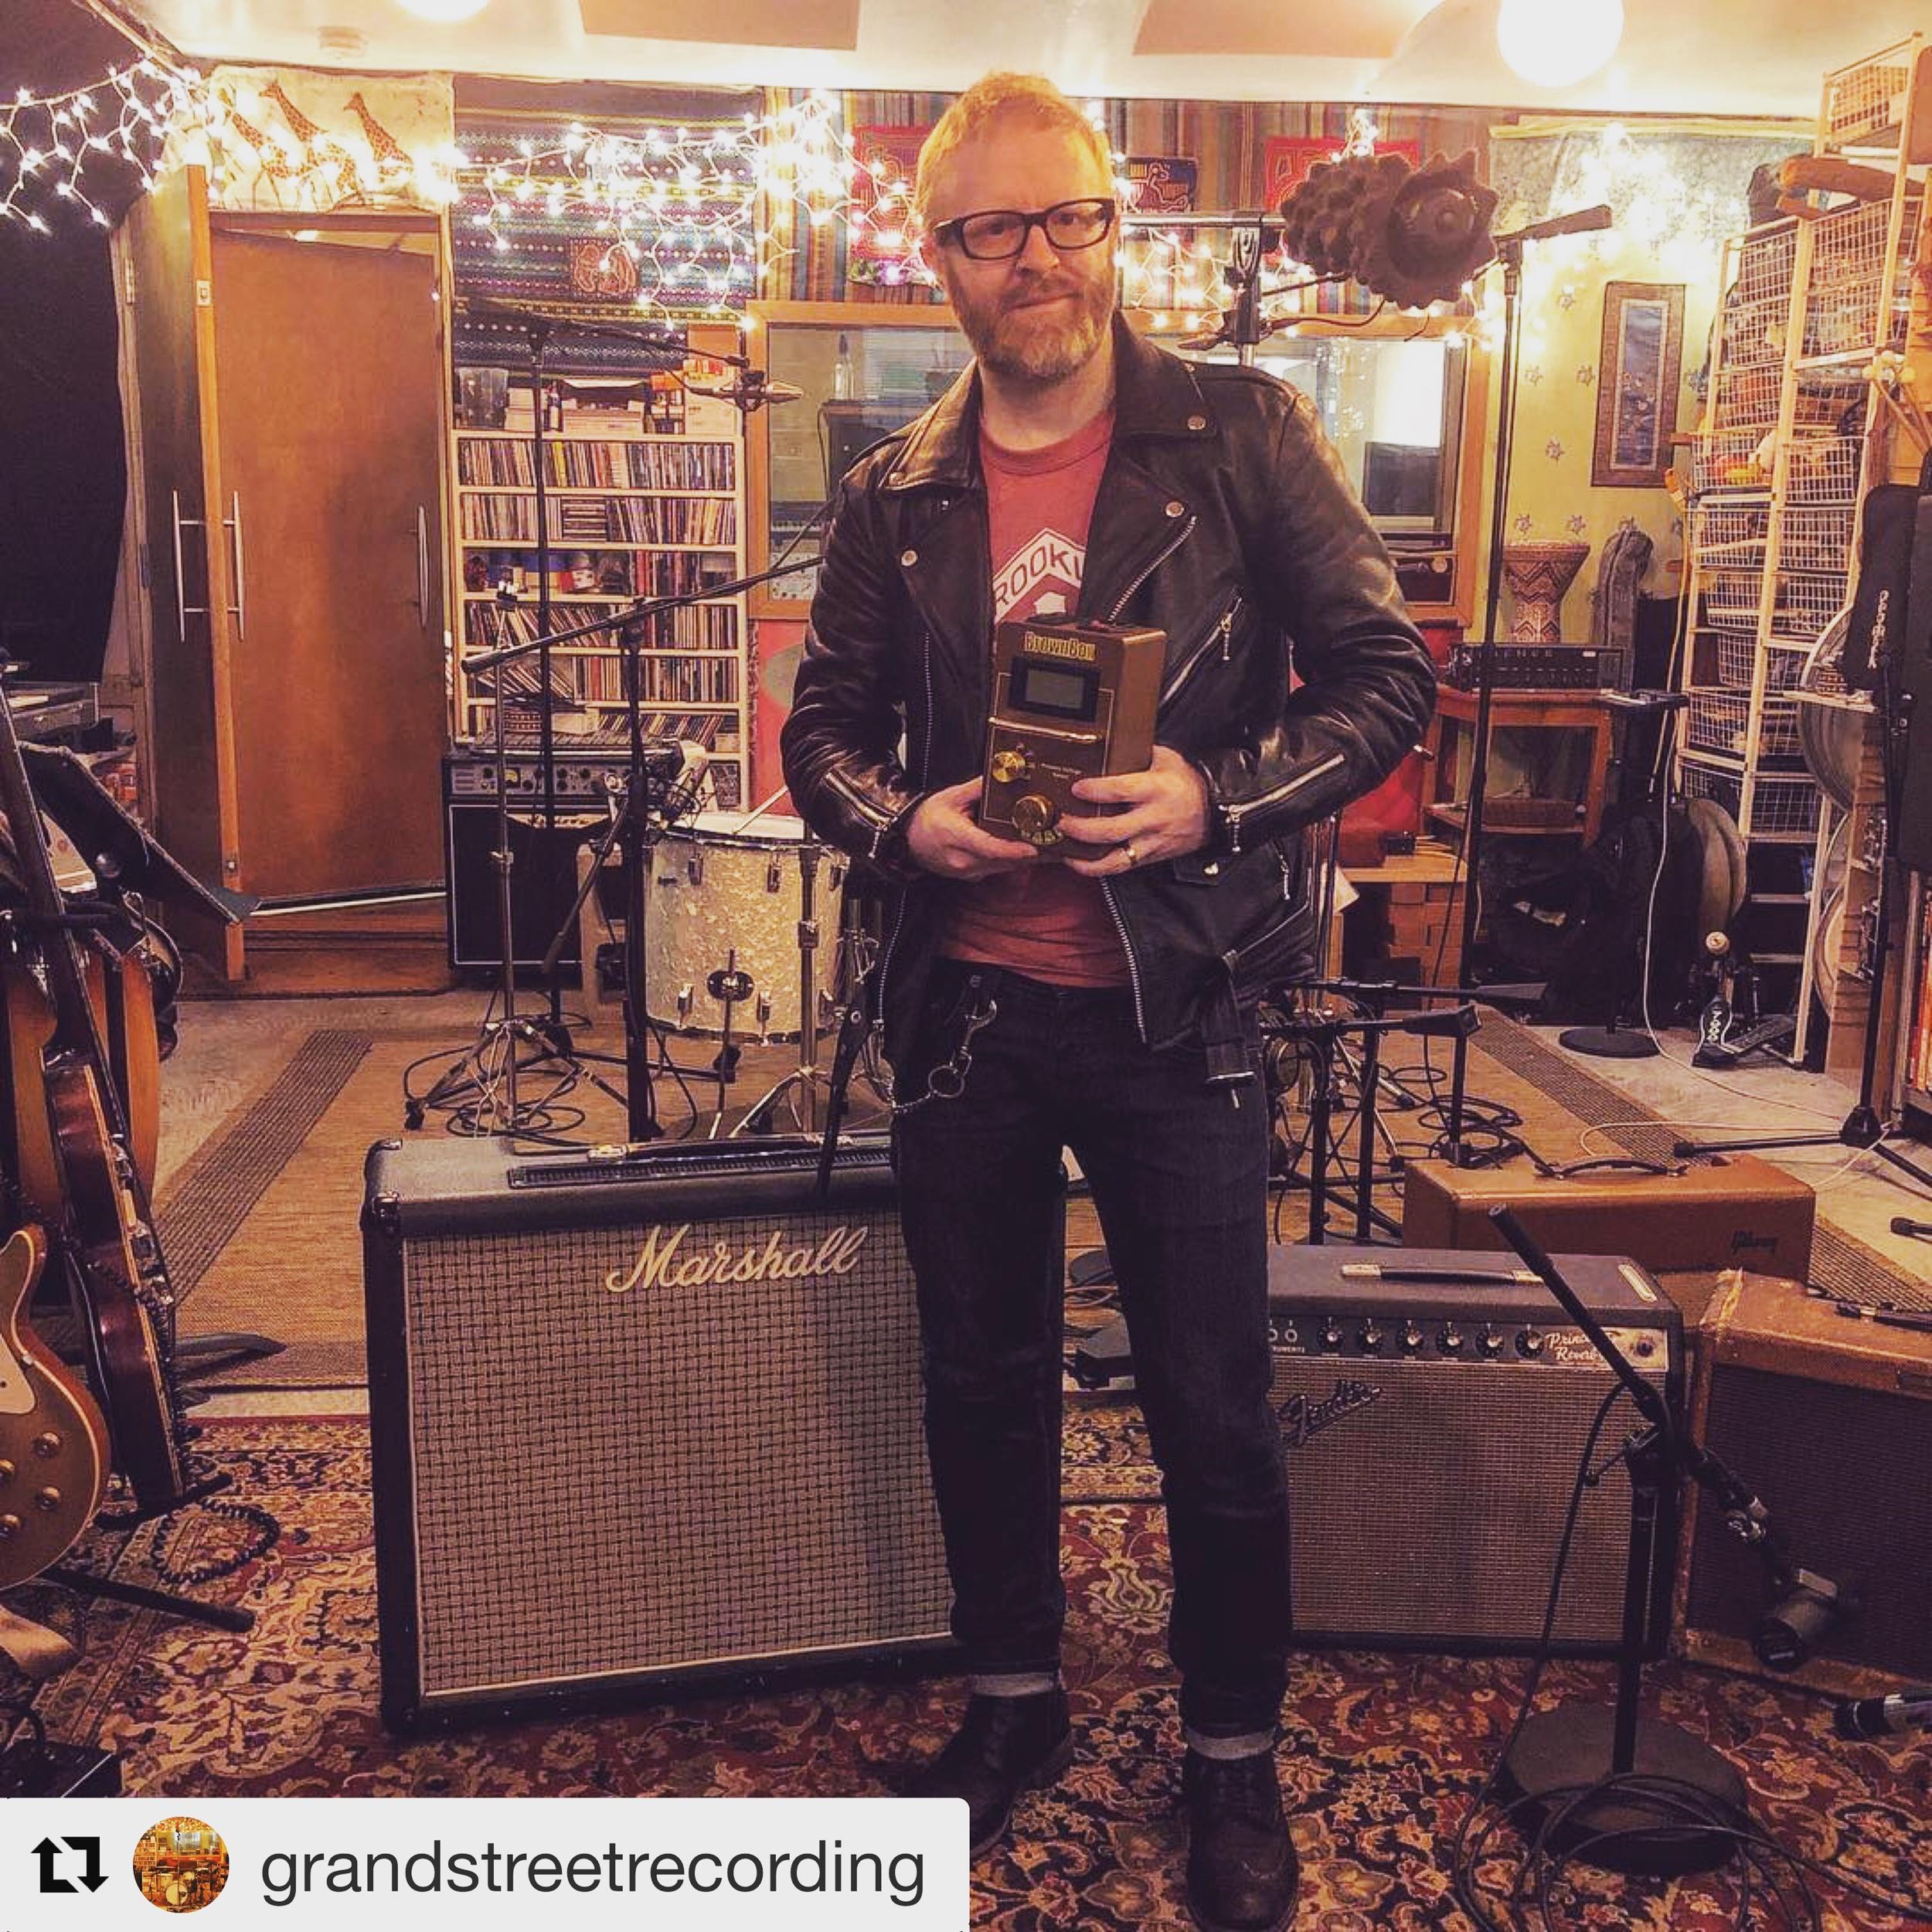 Mark Marshall at Grand Street Recording in Brooklyn, NYC